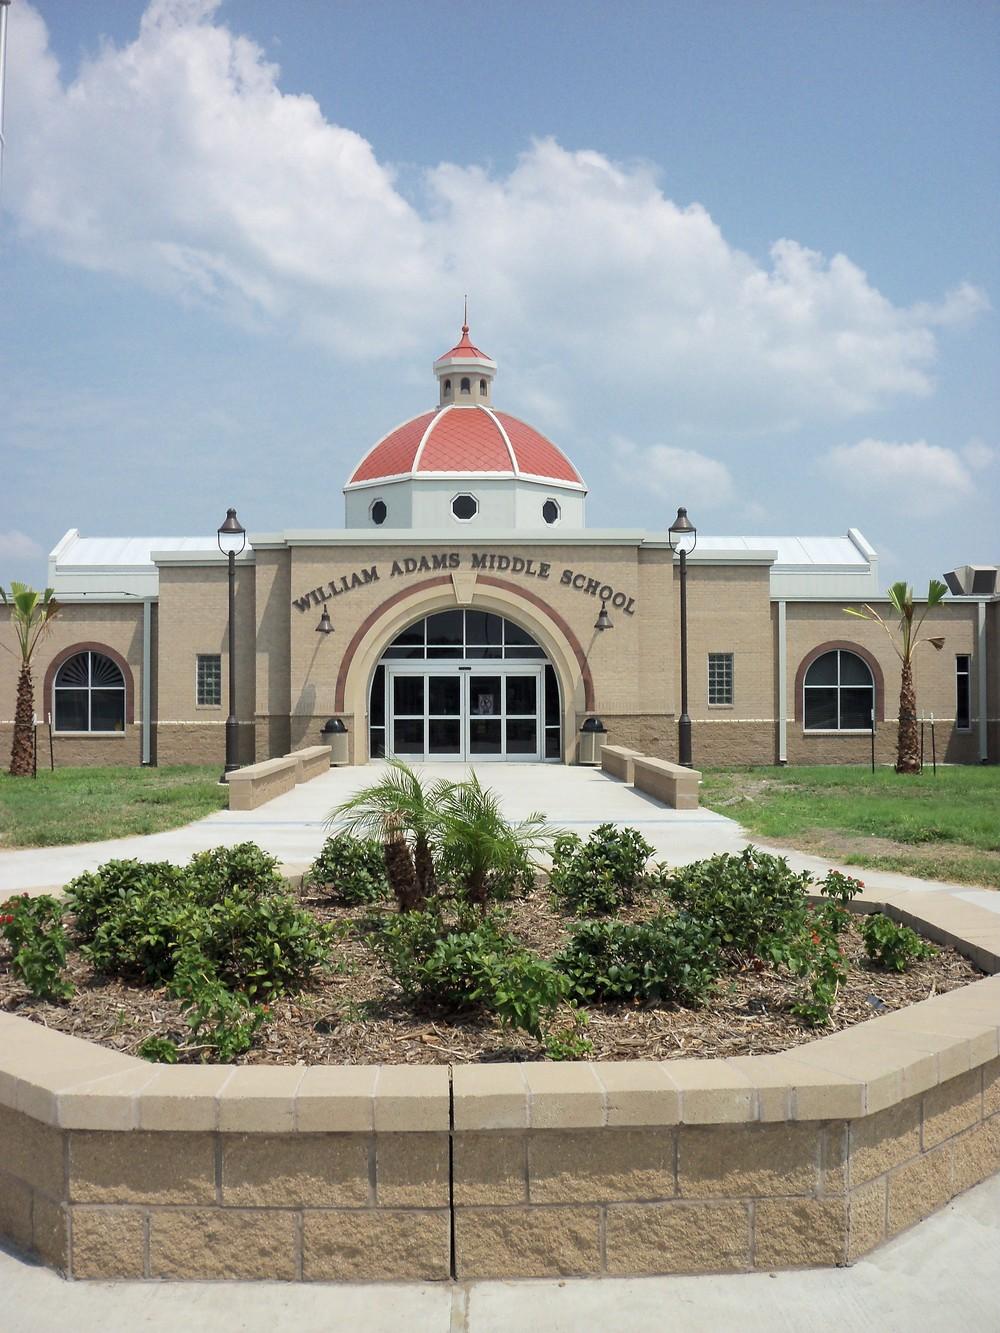 William Adams Middle School